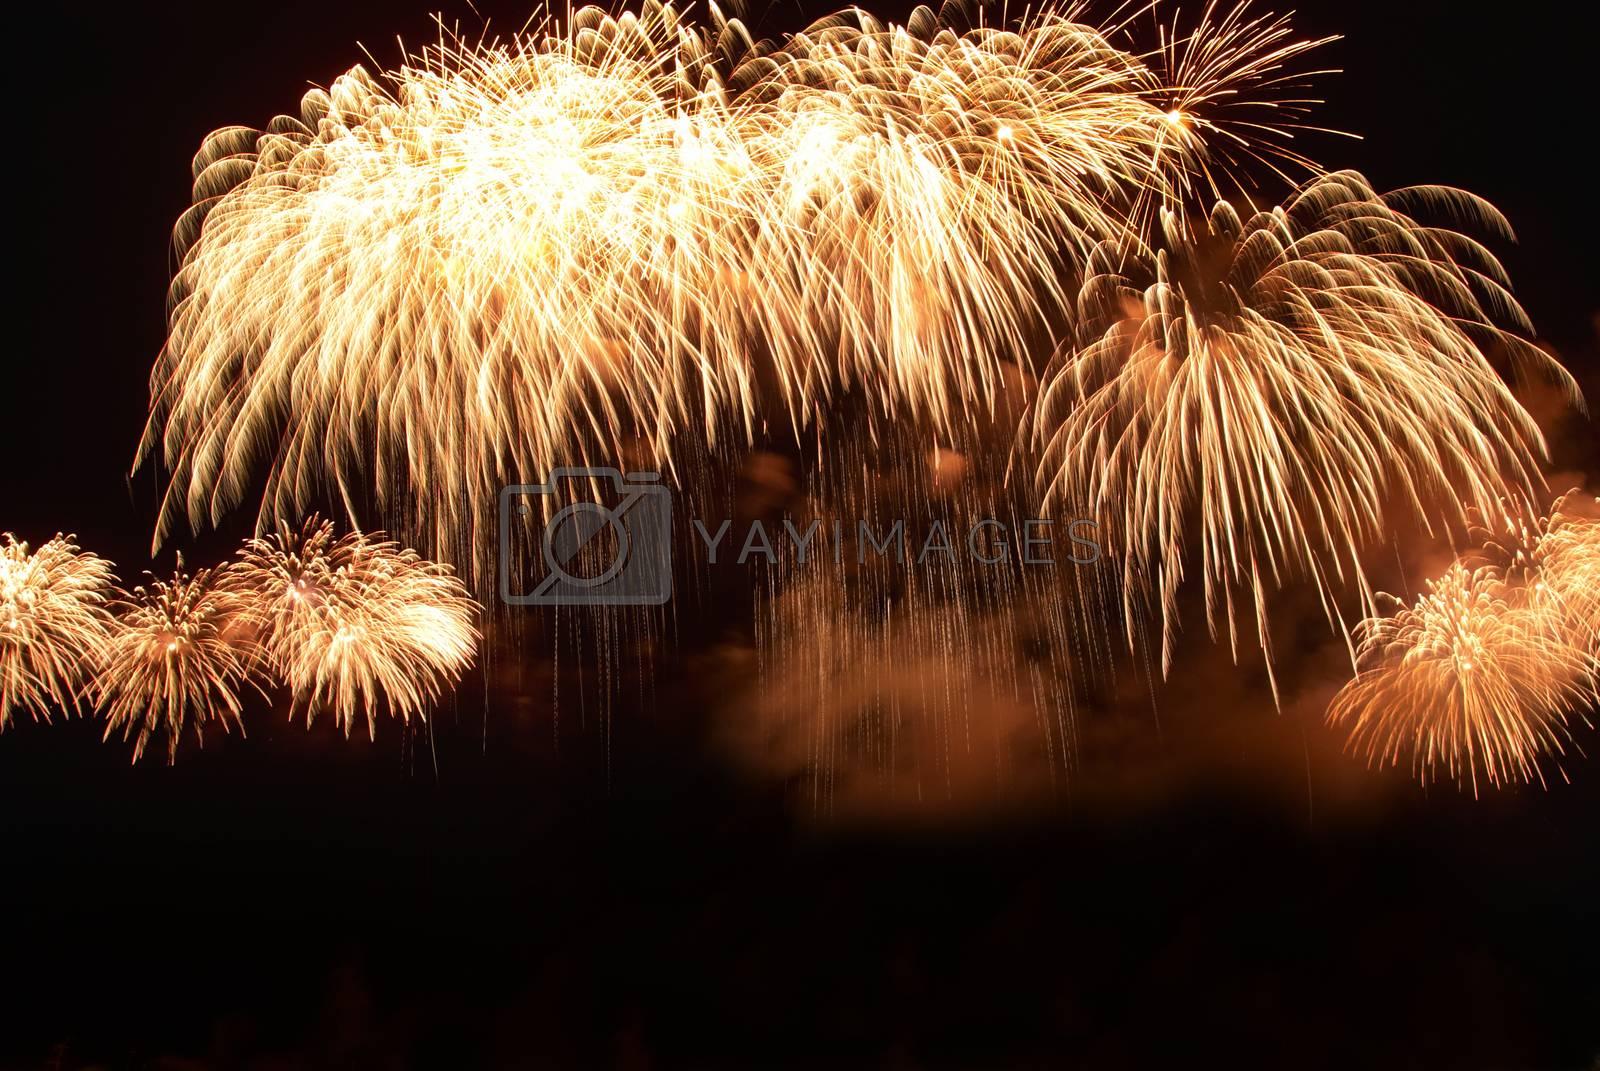 Colorful orange fireworks on the black sky background